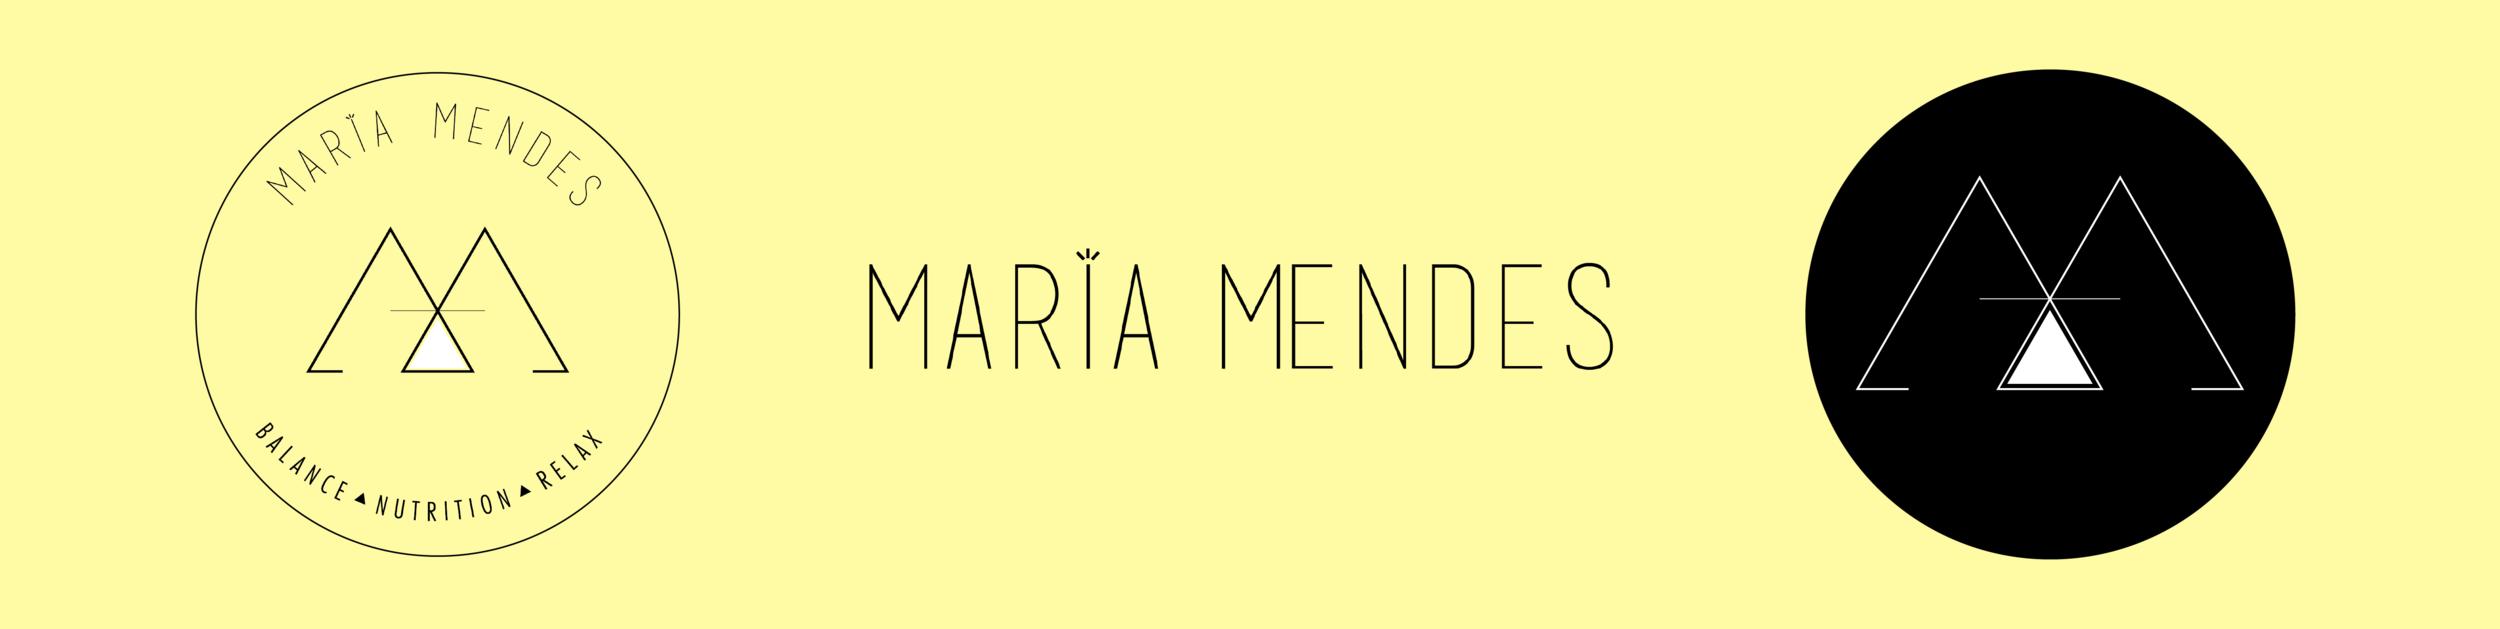 Maria Mendes Branding-11.png